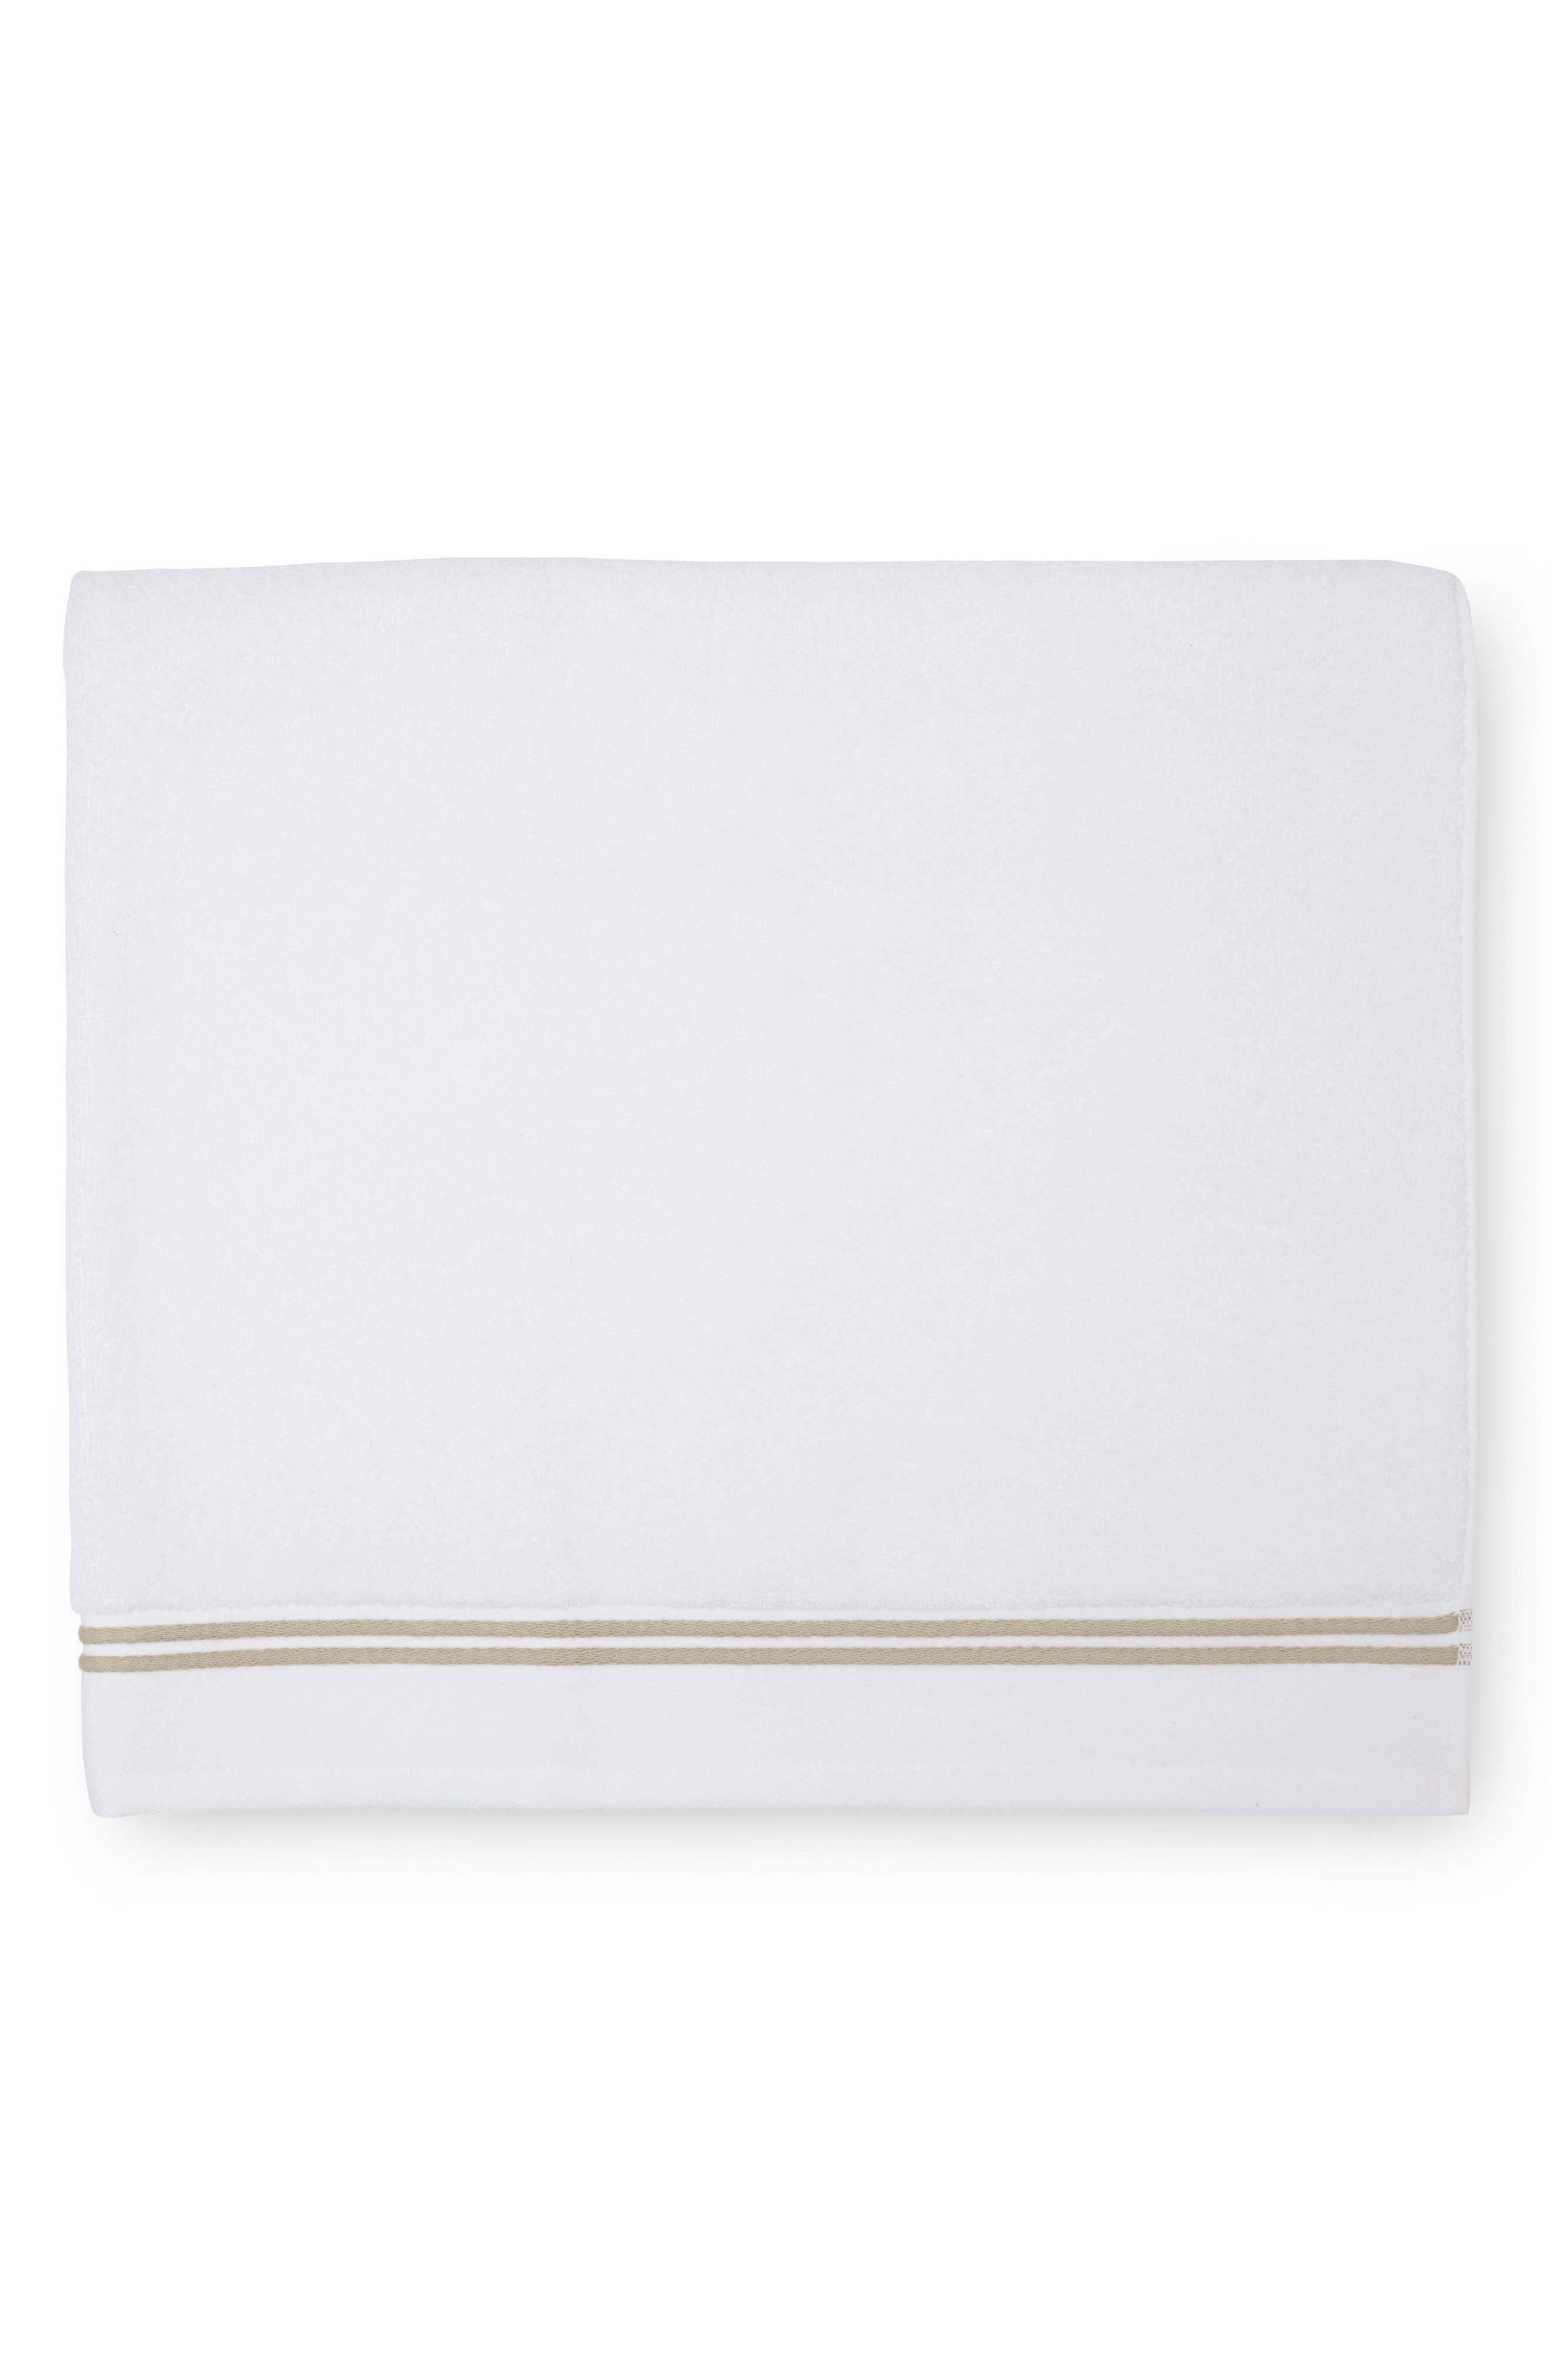 Alternate Image 1 Selected - SFERRA Aura Bath Sheet